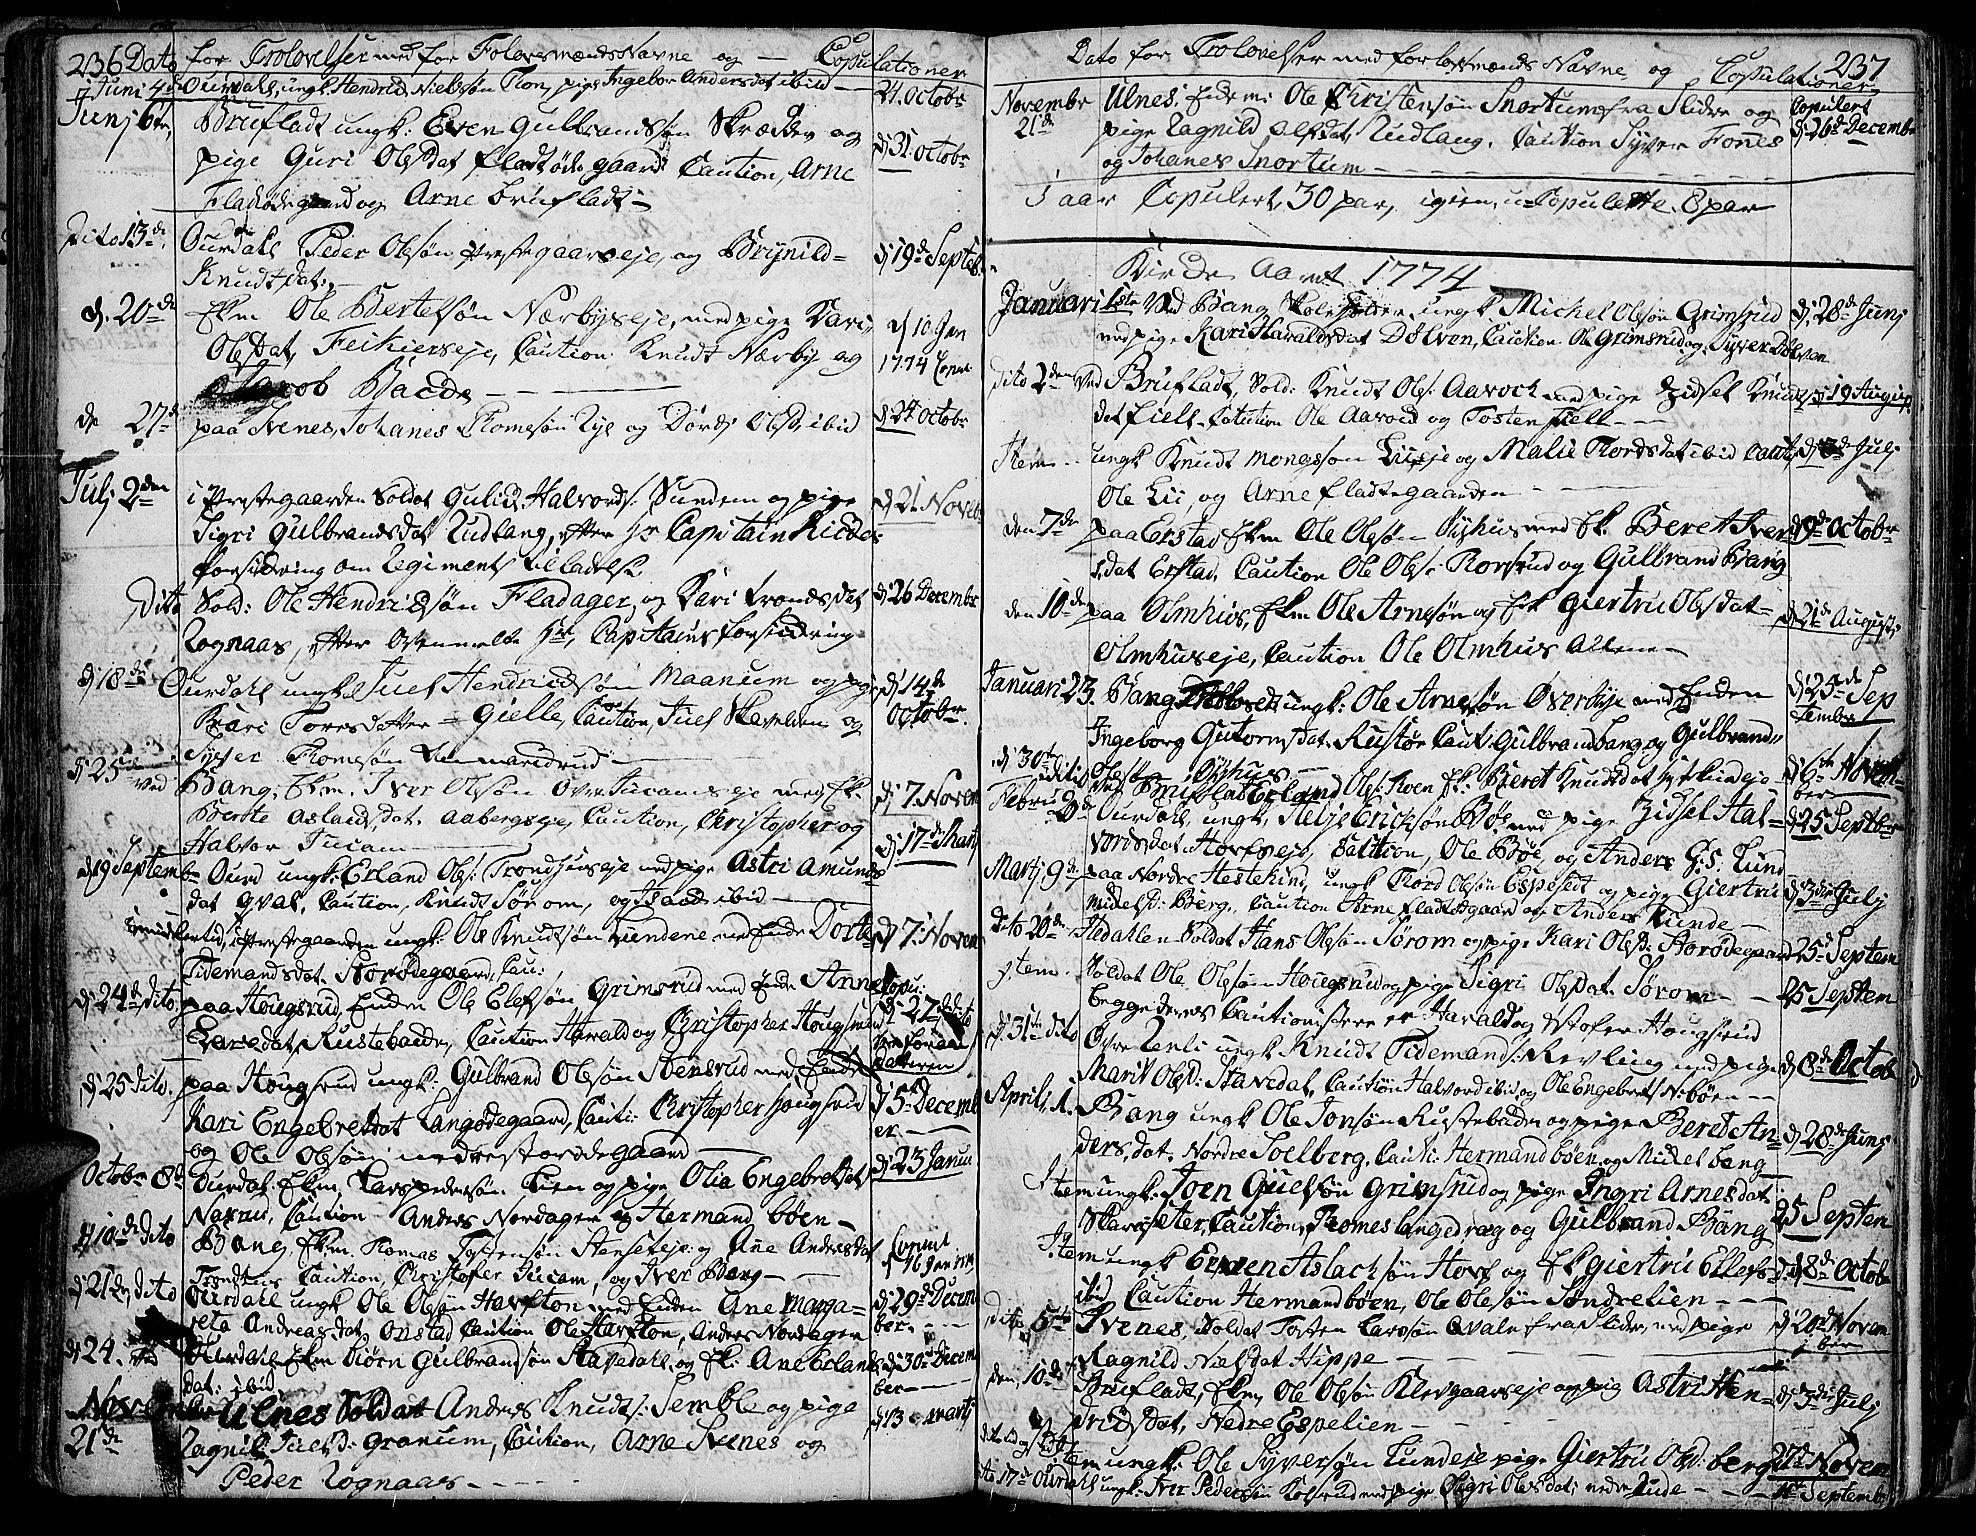 SAH, Aurdal prestekontor, Ministerialbok nr. 5, 1763-1781, s. 236-237